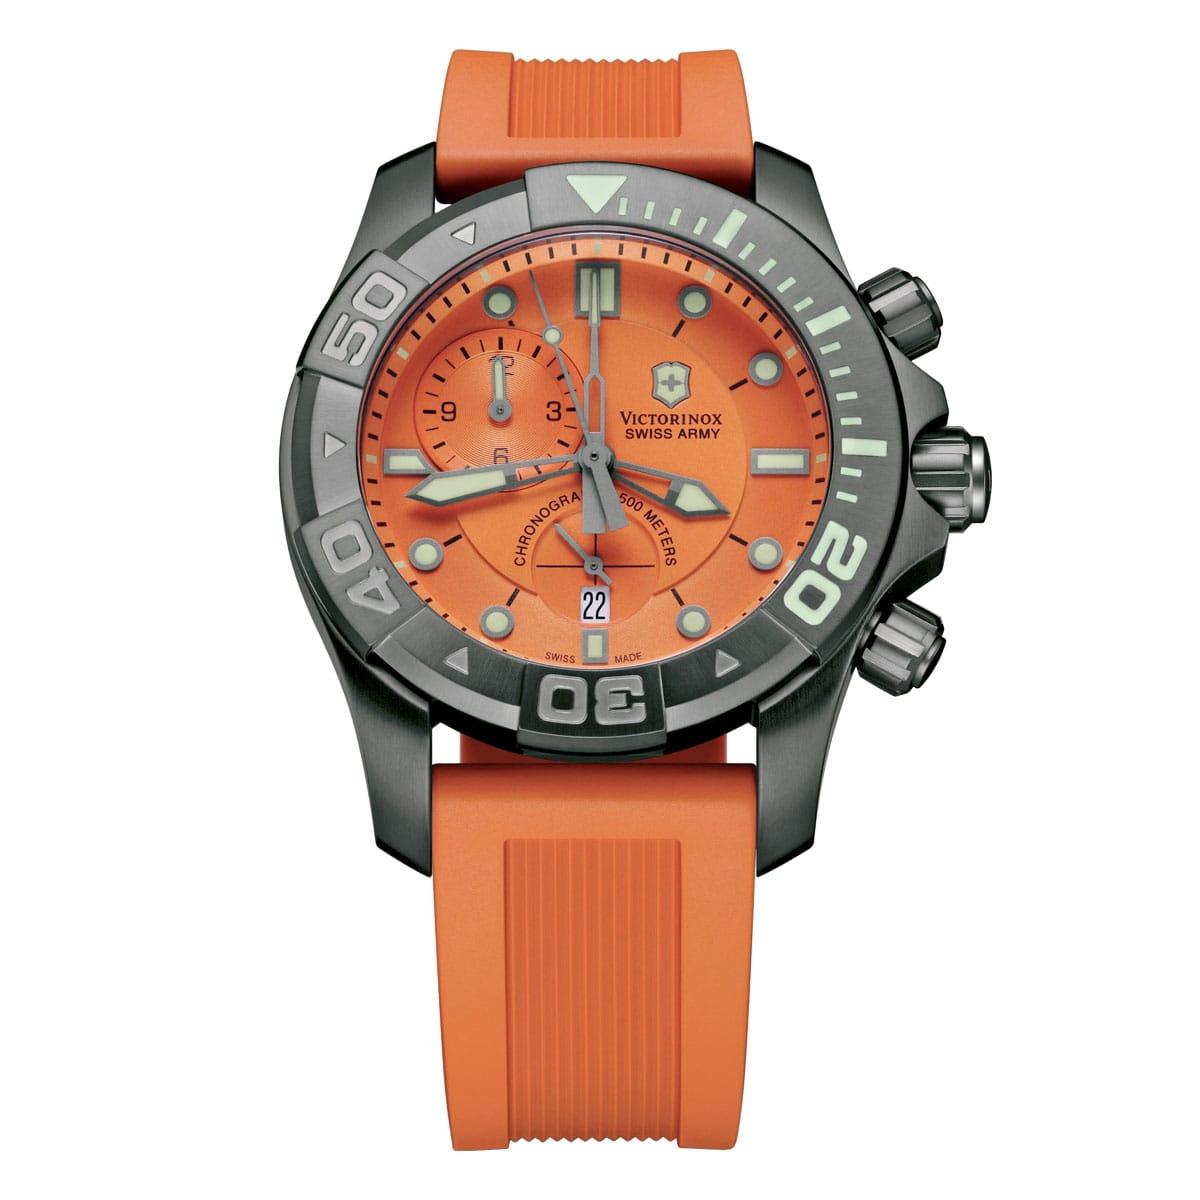 Victorinox Swiss Army - Dive Master 500 Gunmetal Chronograph